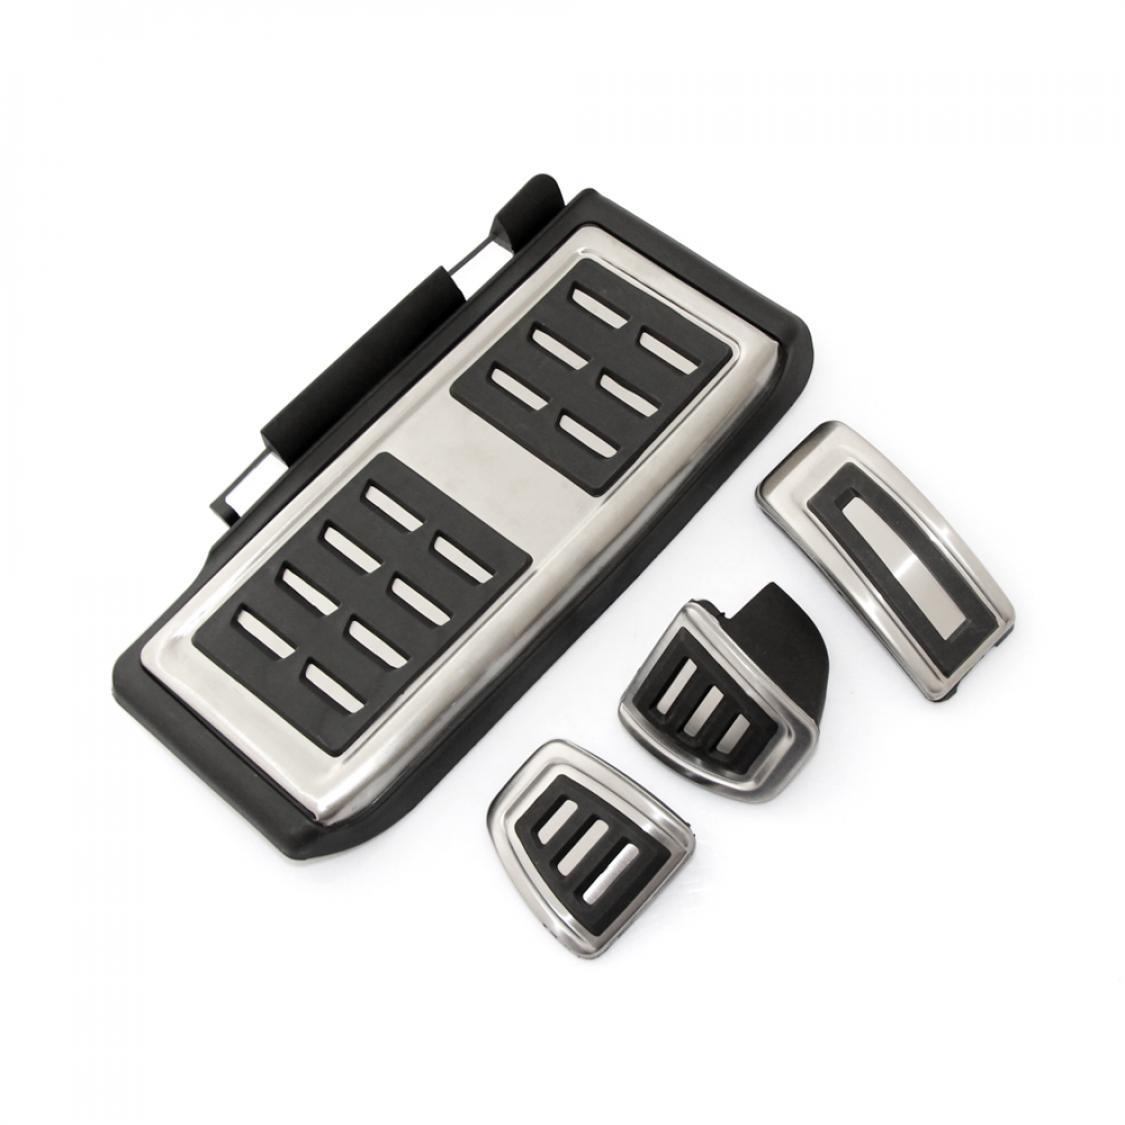 pedal pedale pedalkappen pedalgummi passend f r vw golf 7. Black Bedroom Furniture Sets. Home Design Ideas